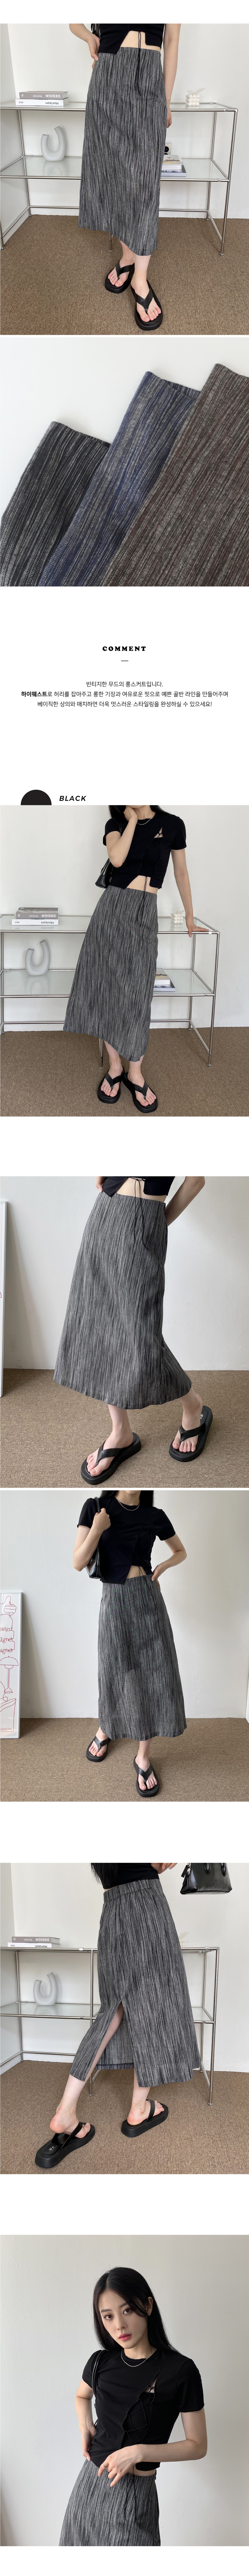 Ms. Vintage Striped Linen Long Skirt